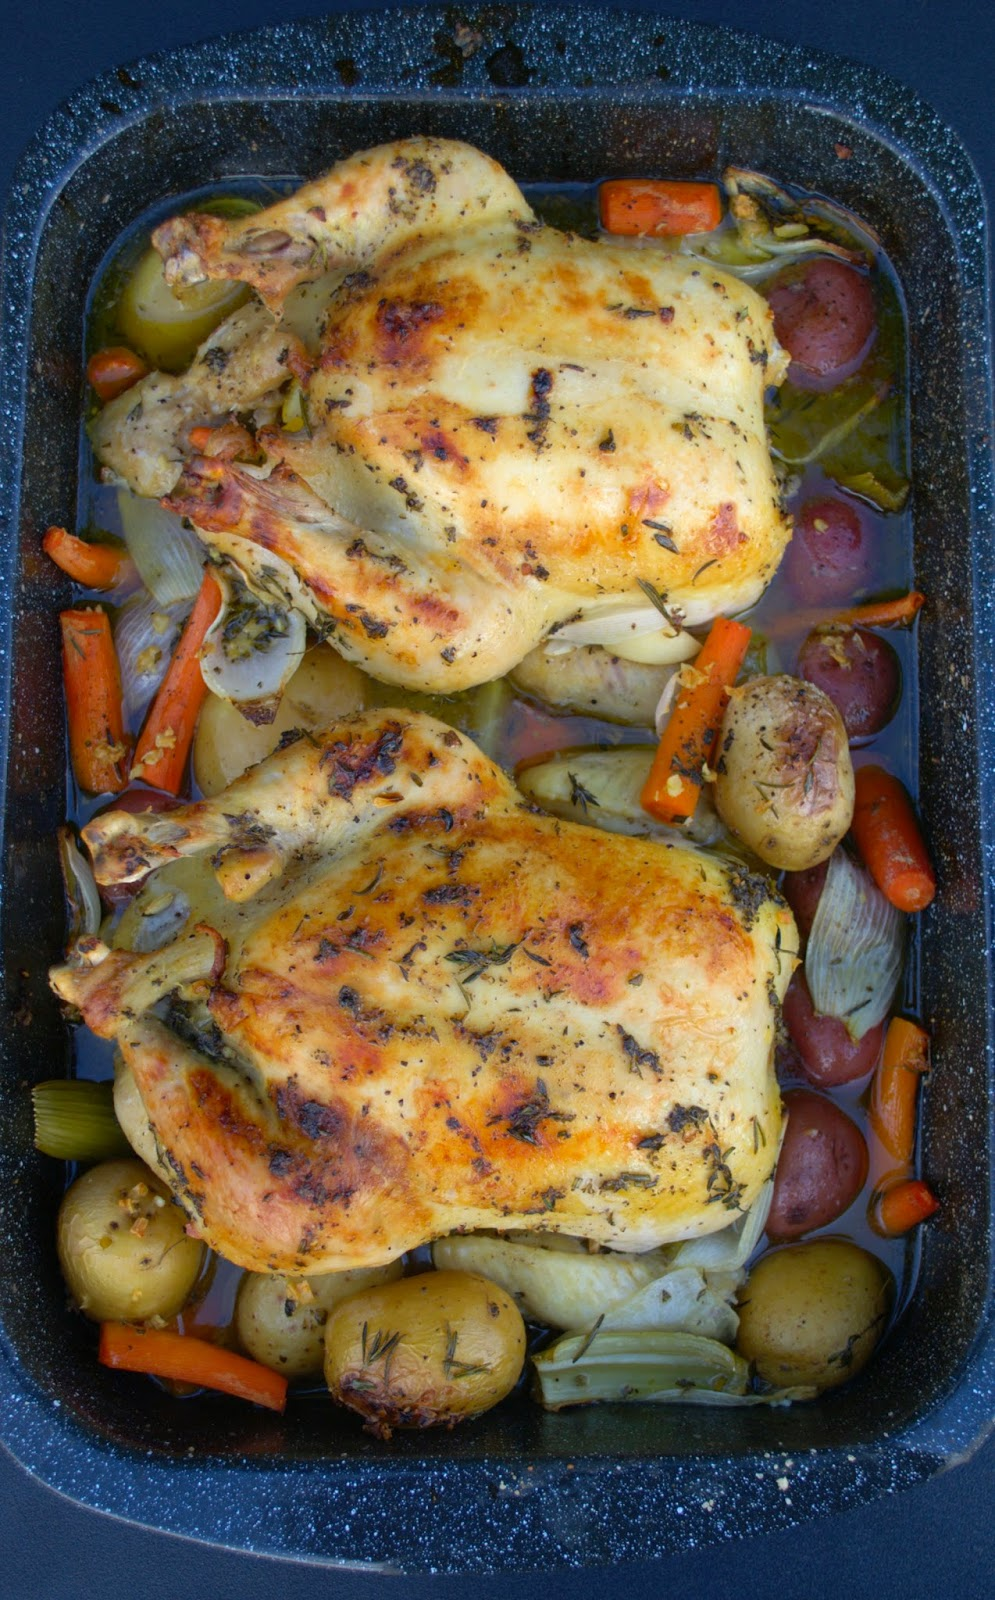 Rosemary and Lemon Roasted Chicken